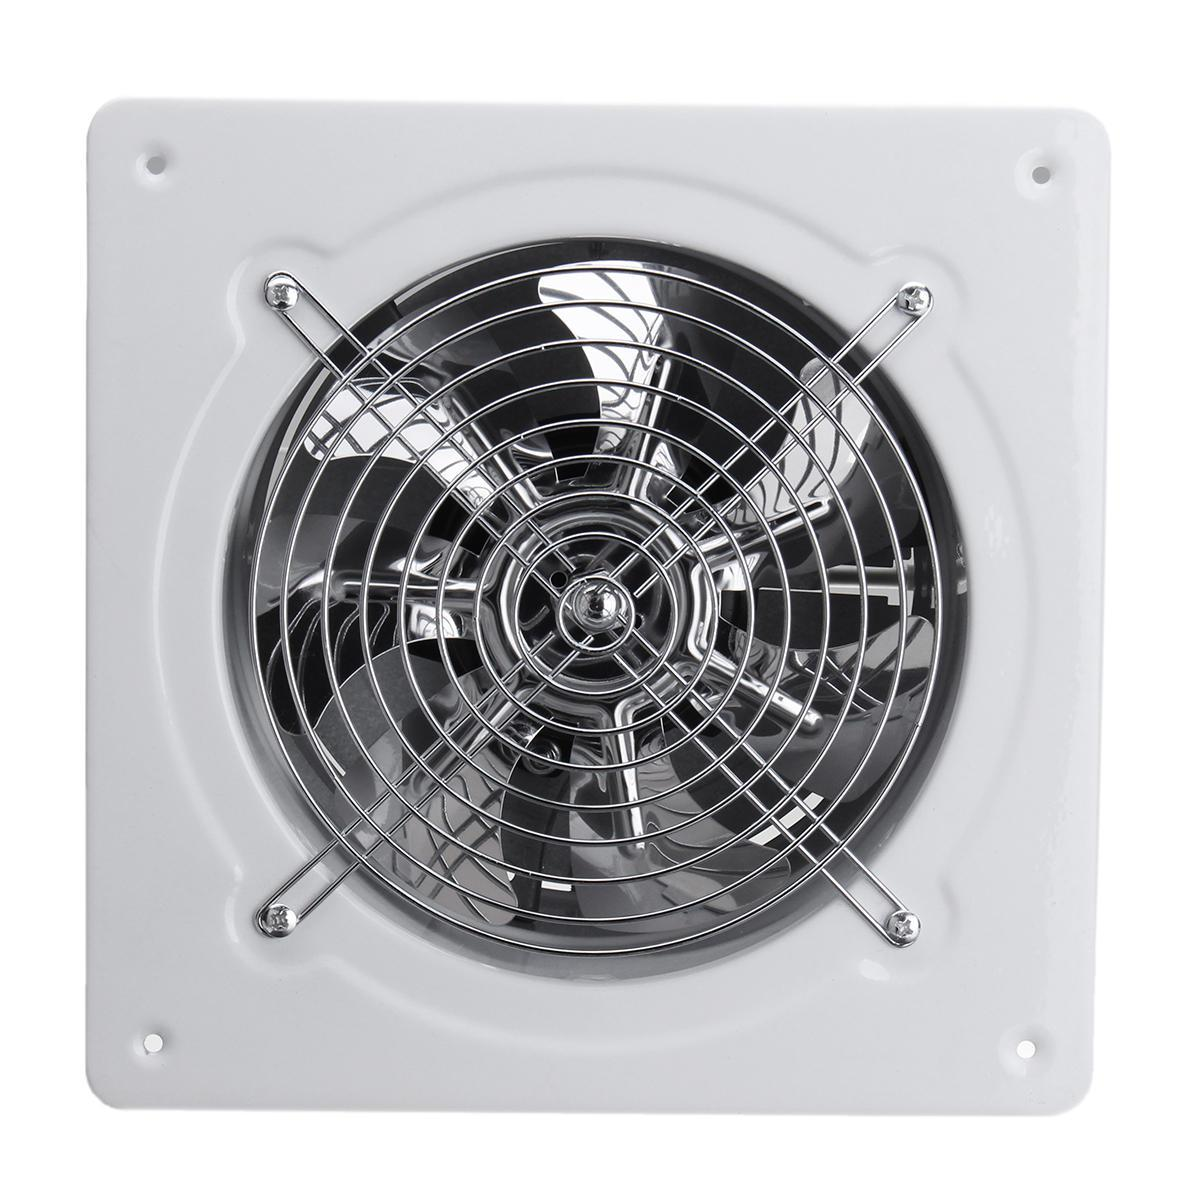 20w 4inch inline duct booster fan exhaust blower air ventilation fan vent